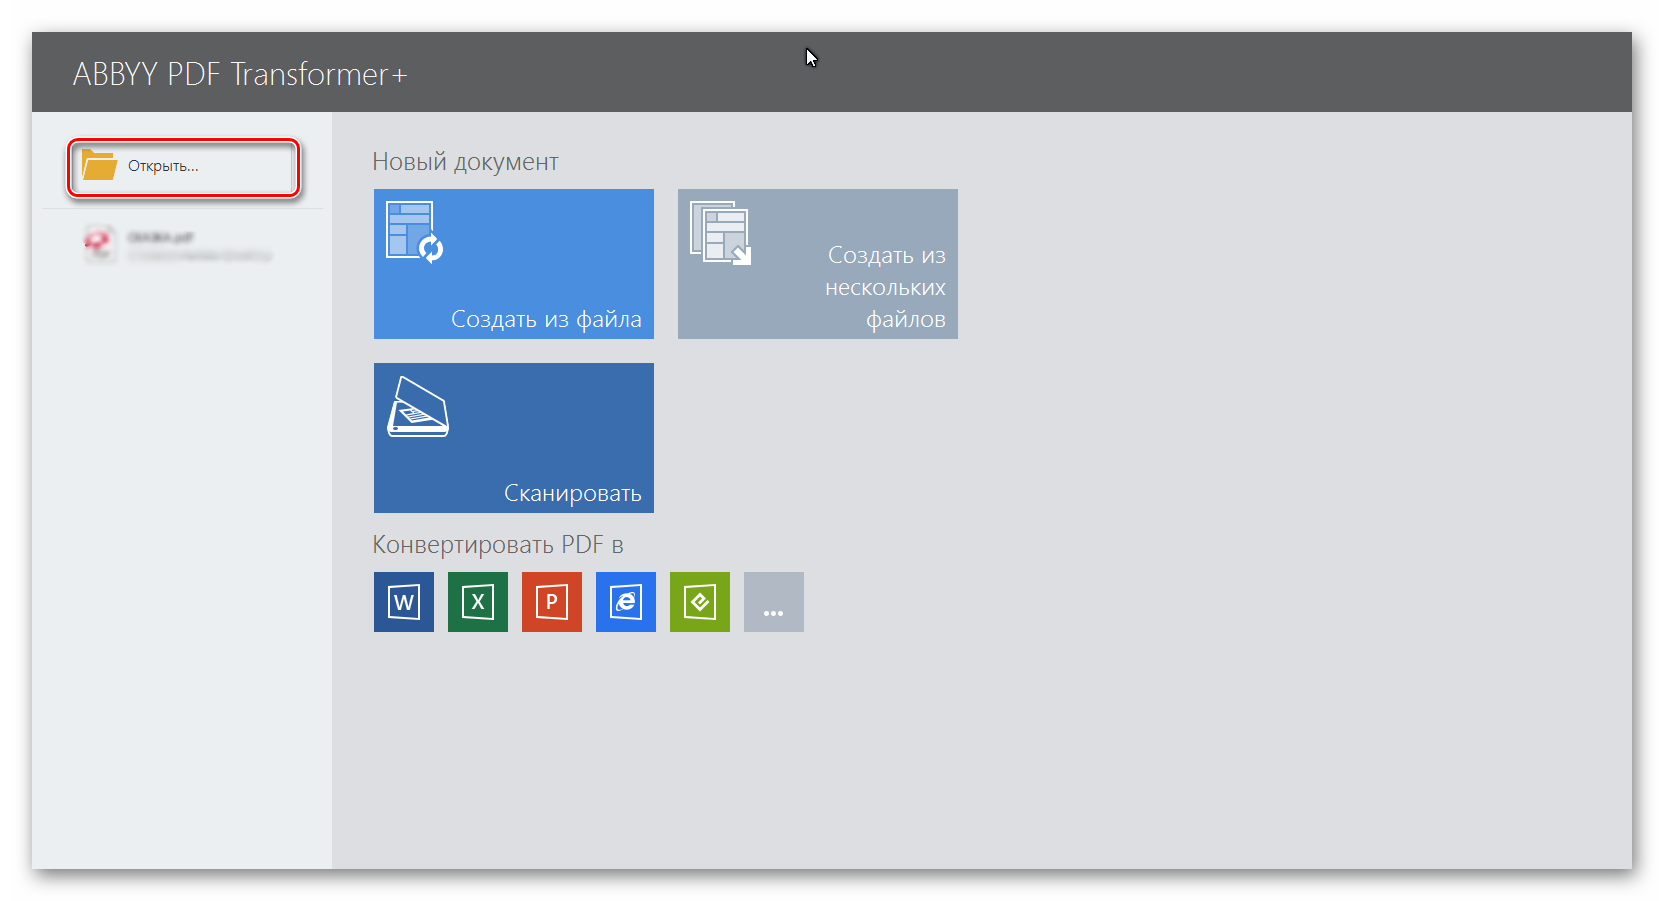 открытия файла в ABBYY PDF Transformer+